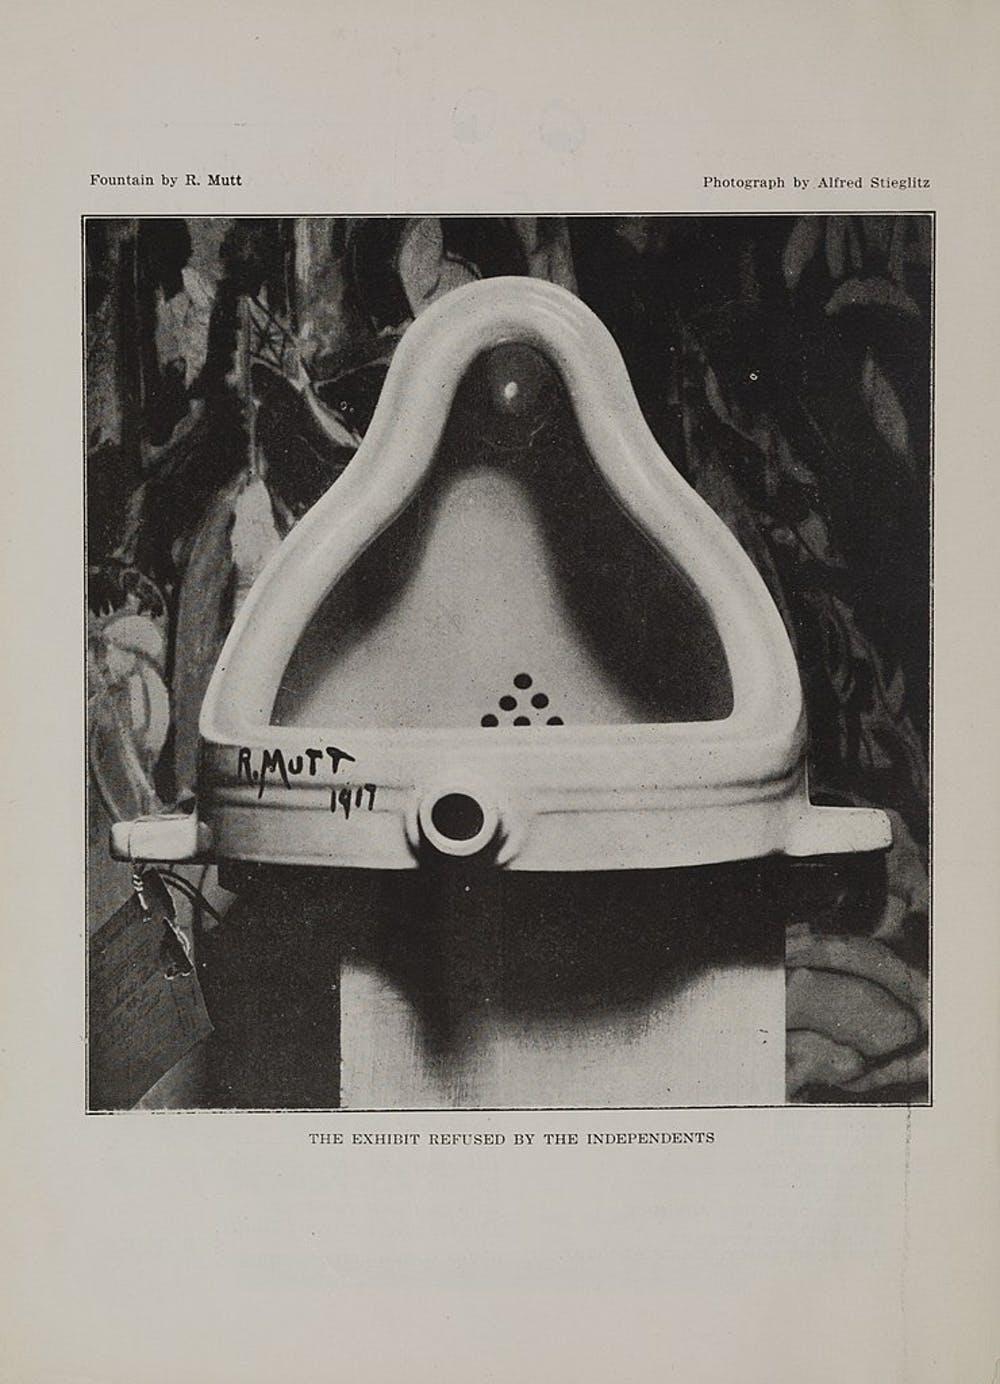 Fotografía de 'Fountain' publicada en 'The blind man' (Marcel Duchamp, 1917). MET